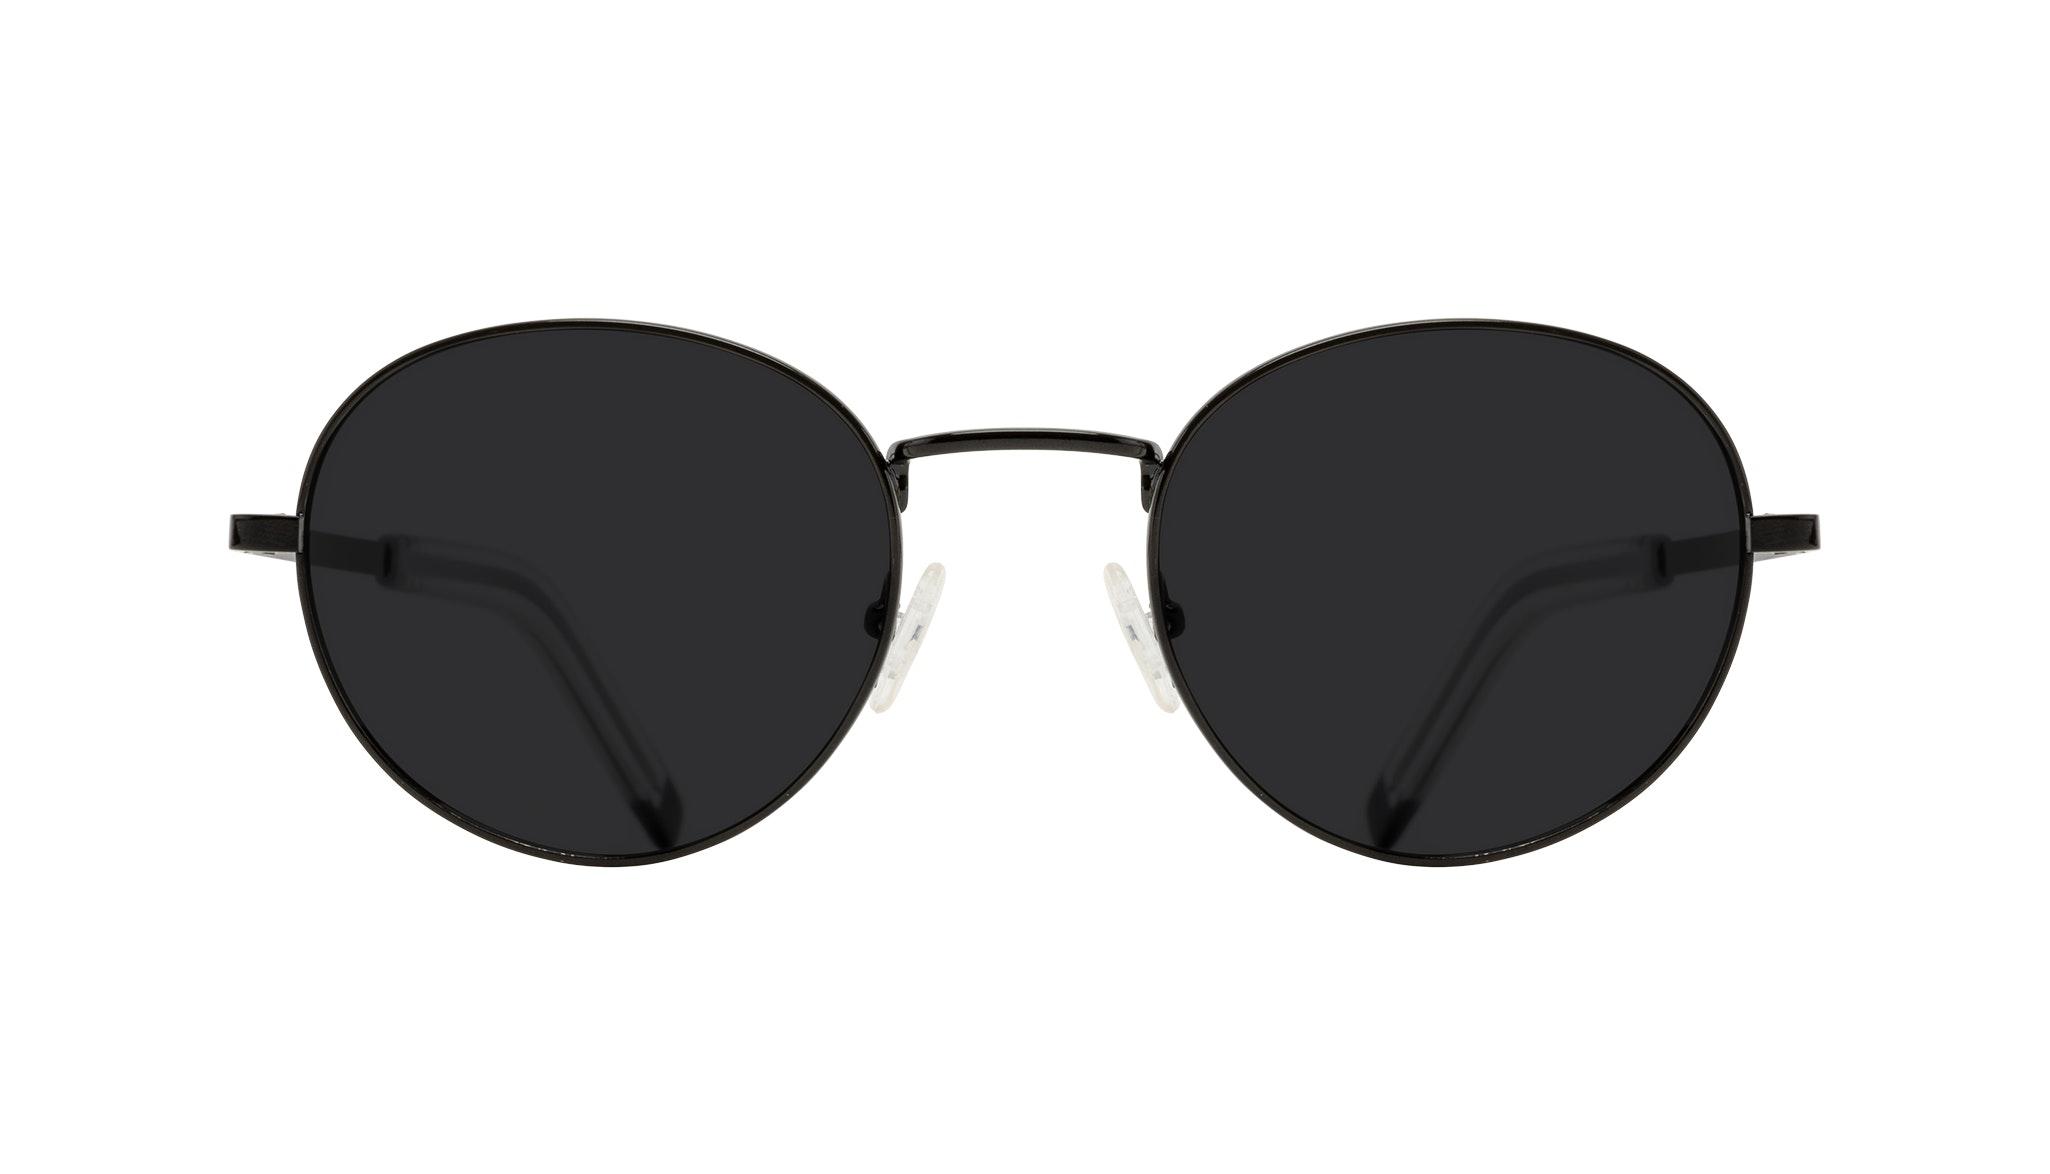 Affordable Fashion Glasses Round Sunglasses Men Lean XL Black Front